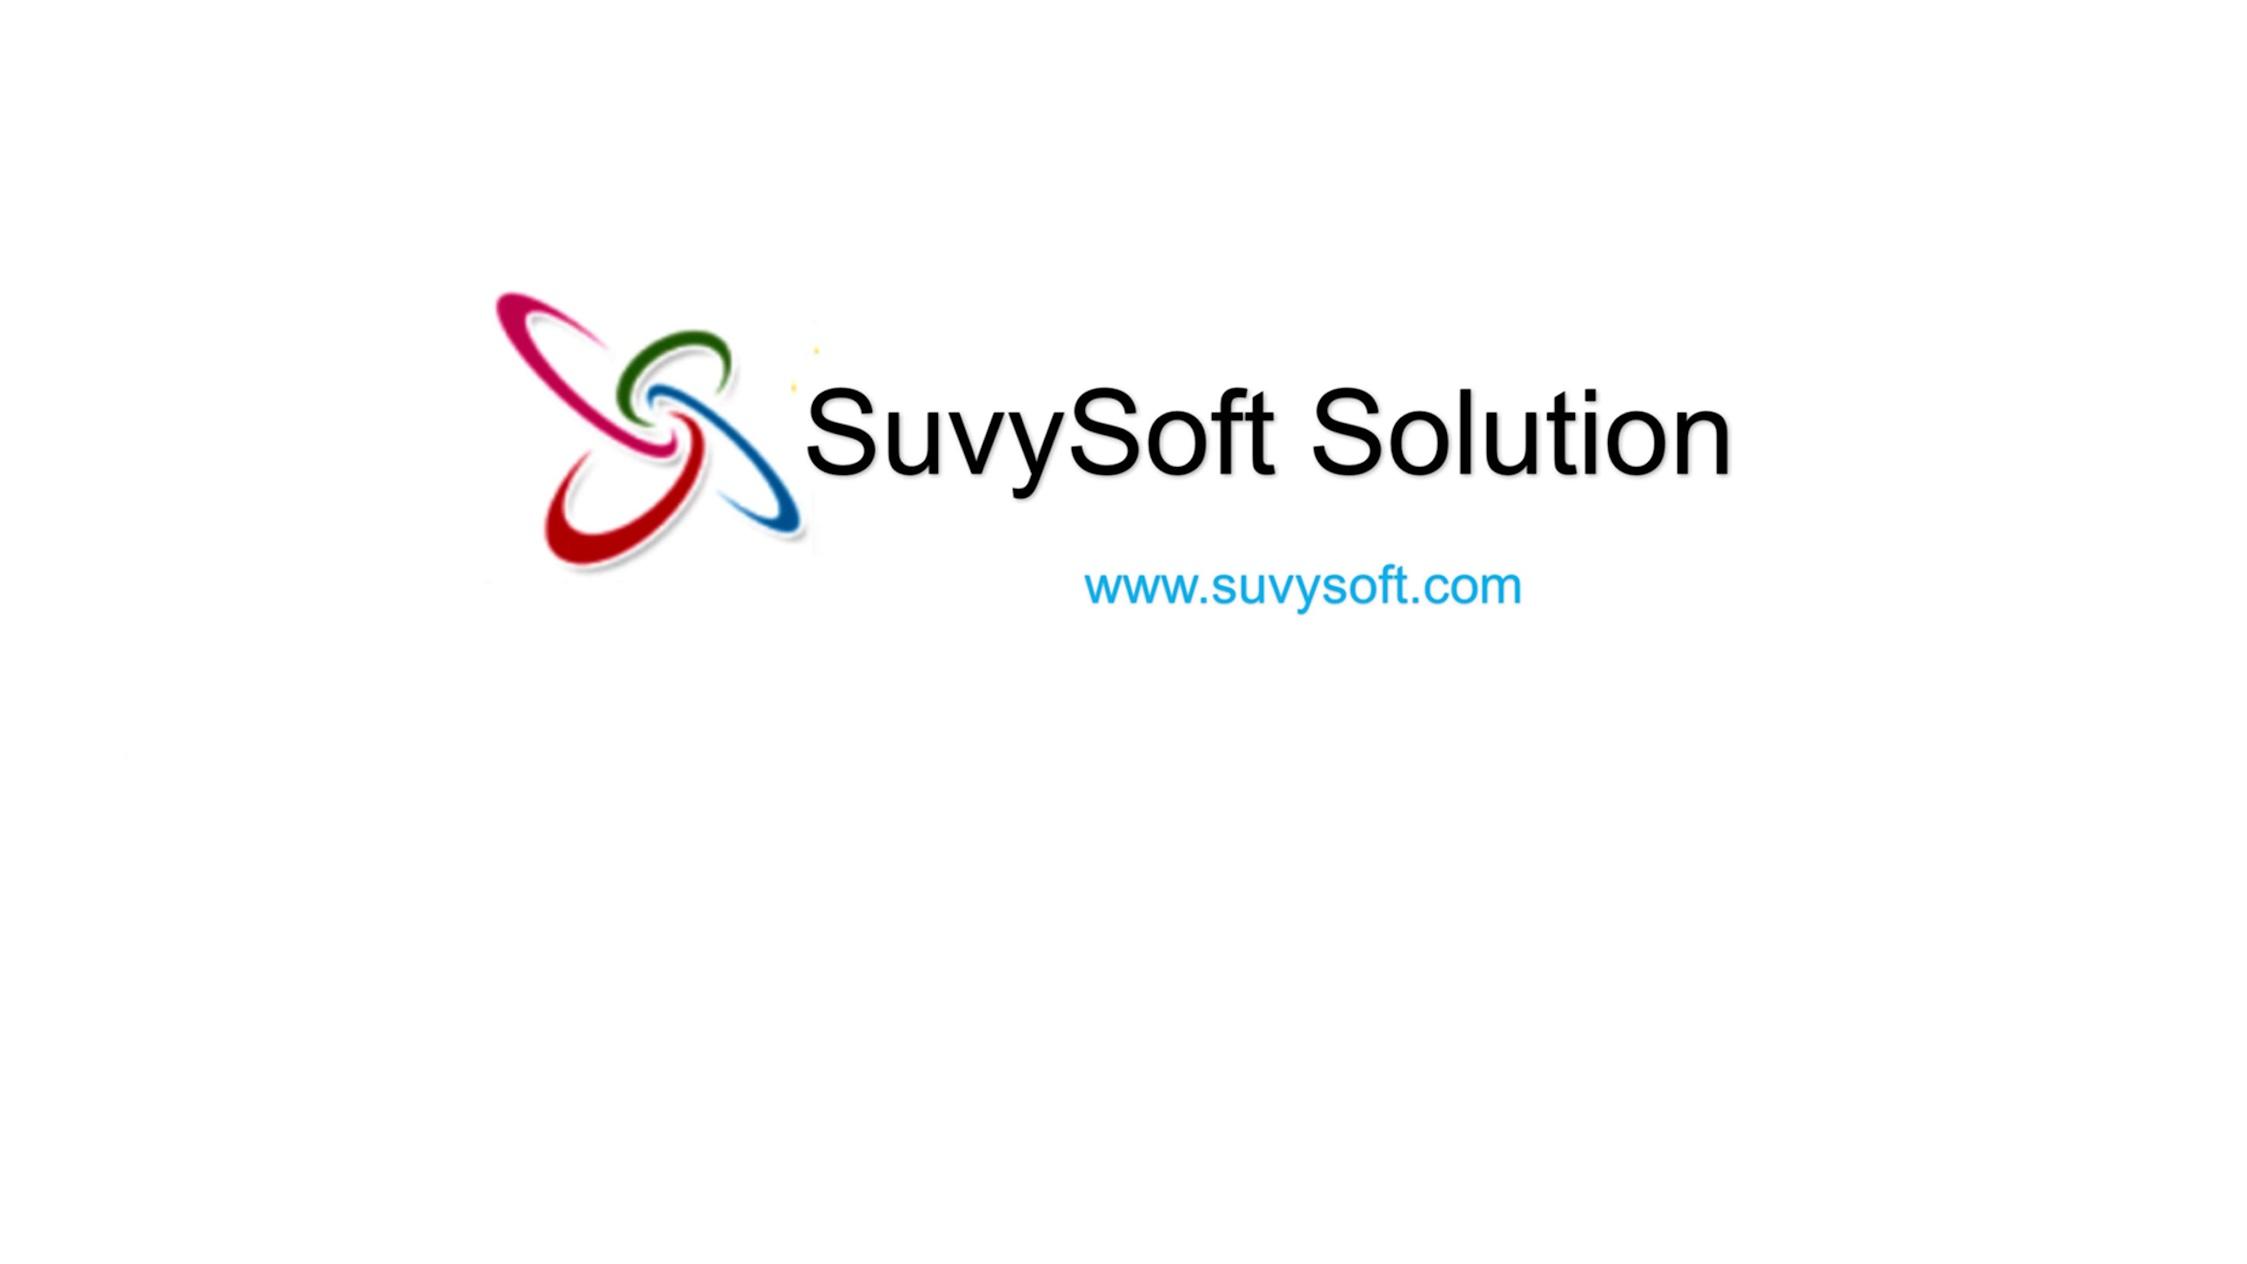 SuvySoft Solution